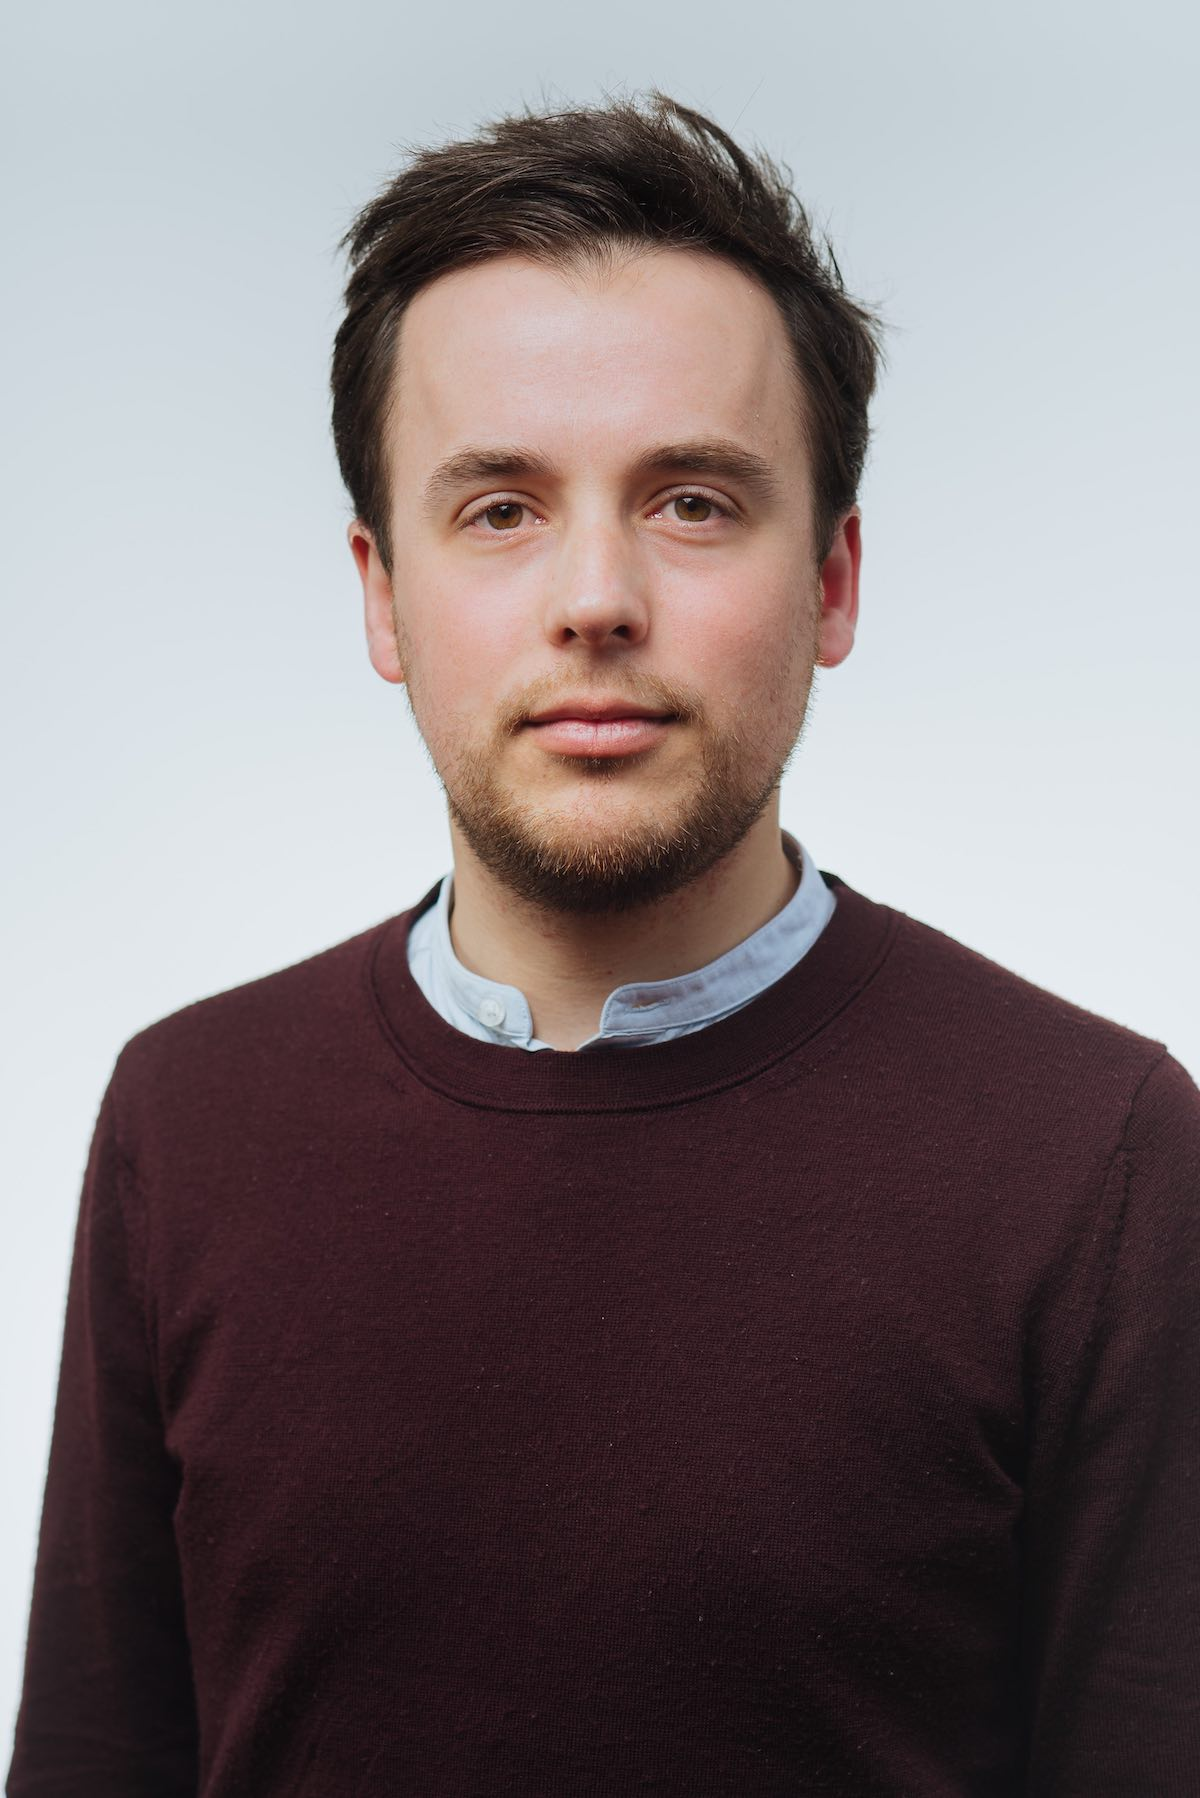 Richard Mabey headshot